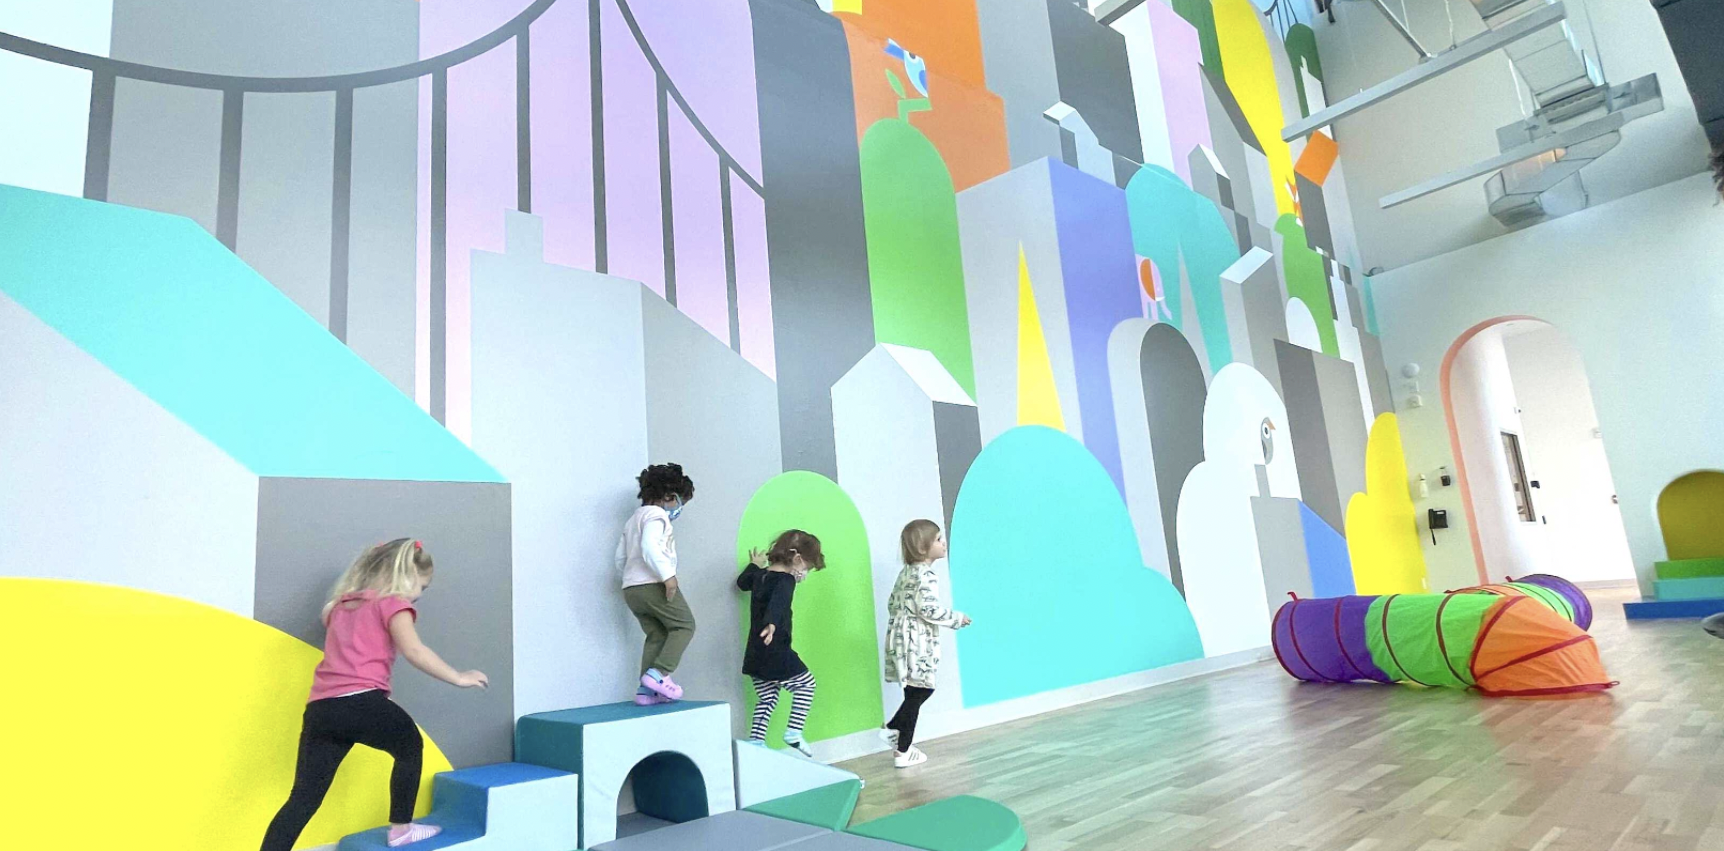 Speech and Motor Development for Children through Play at Vivvi